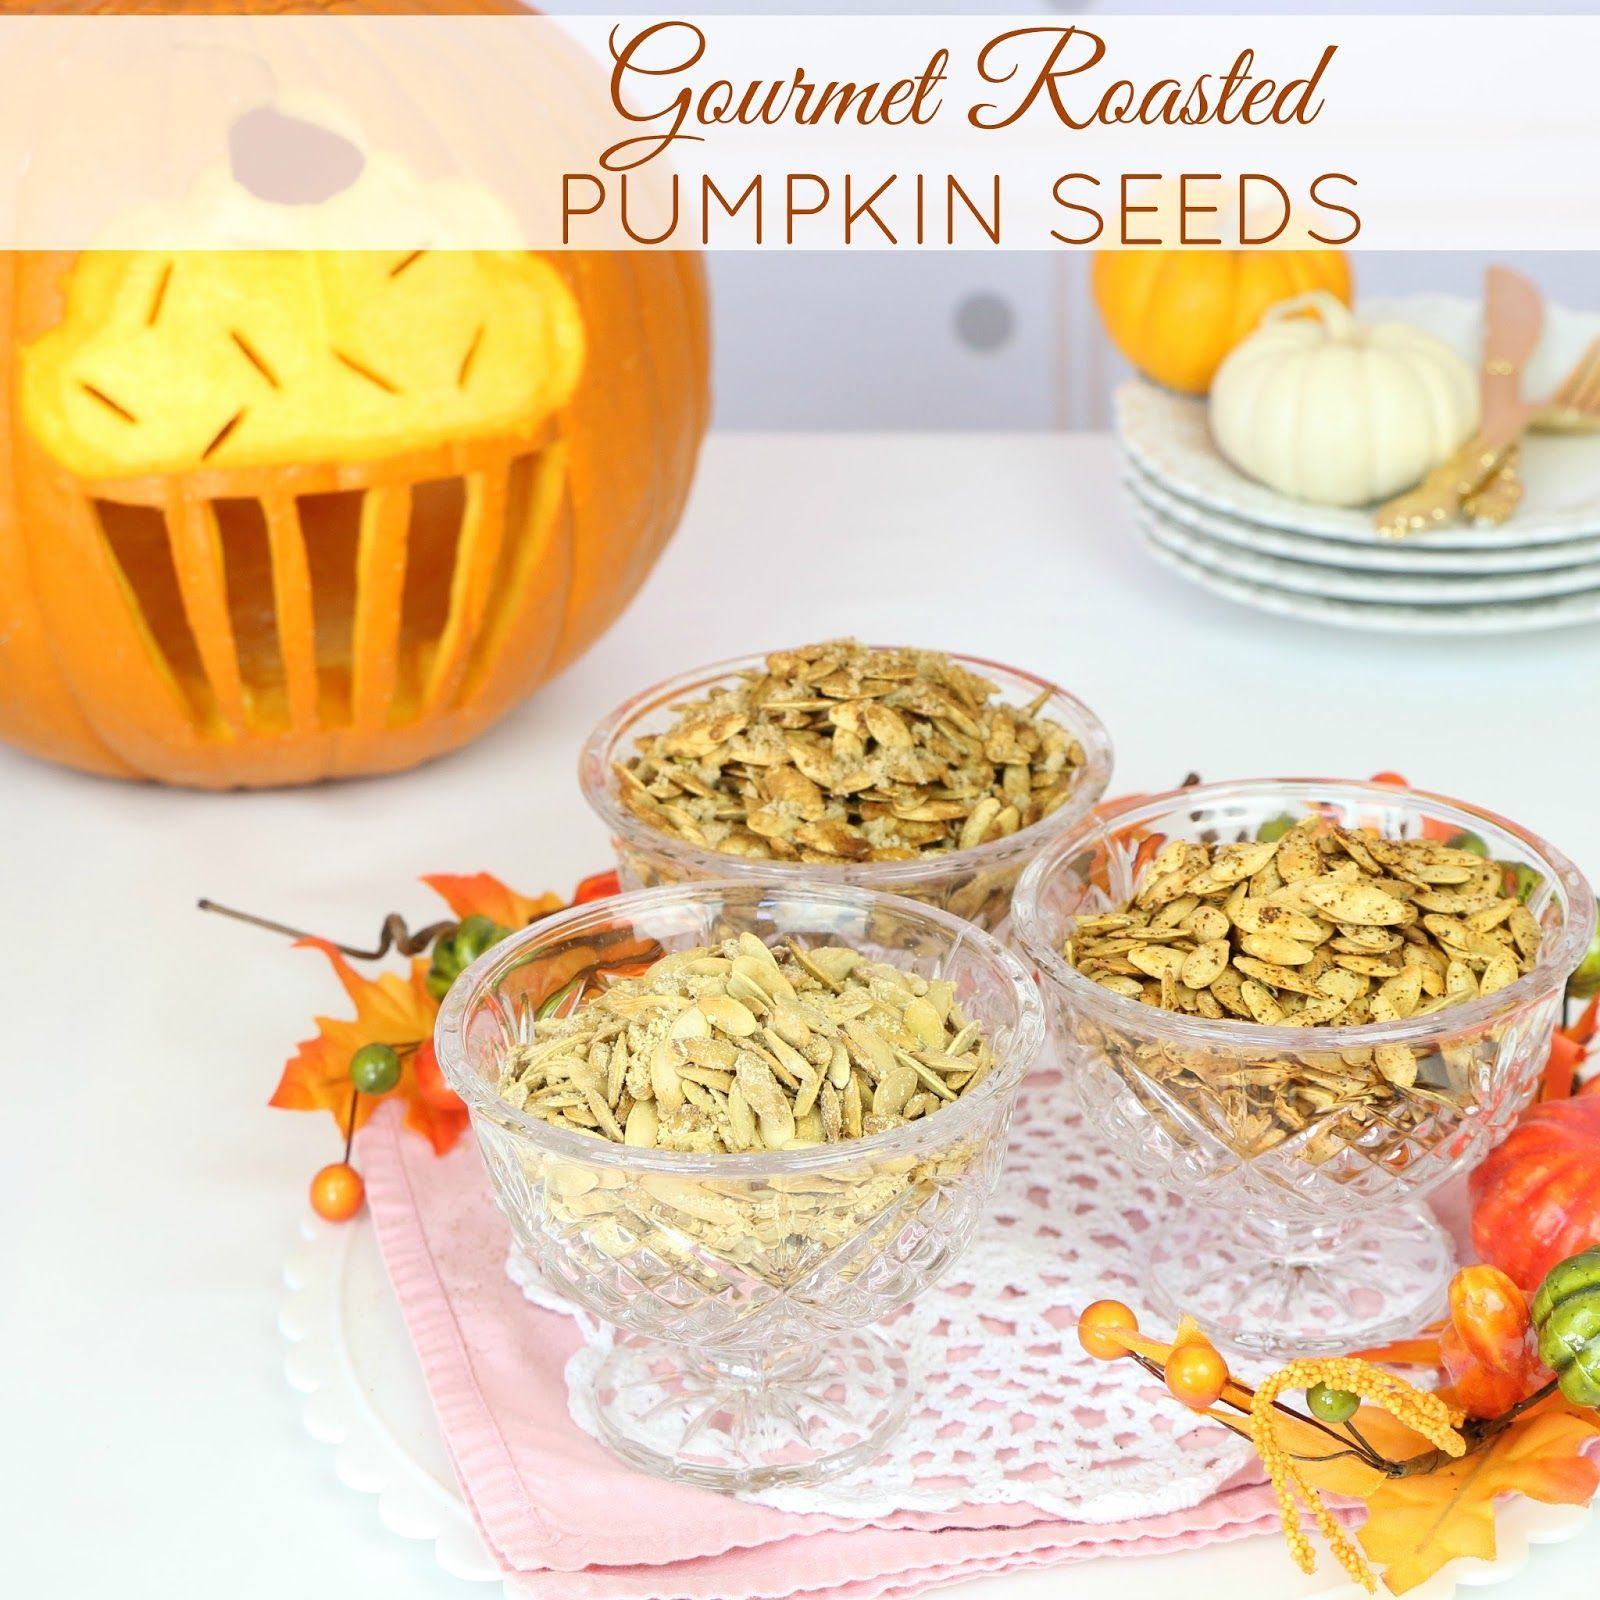 Lindsay Ann Bakes: VIDEO Flavored Roasted Pumpkin Seeds (classic, sweet, salty...#ann #bakes #classic #flavored #lindsay #pumpkin #roasted #salty #seeds #sweet #video #pumpkinseedsrecipebaked